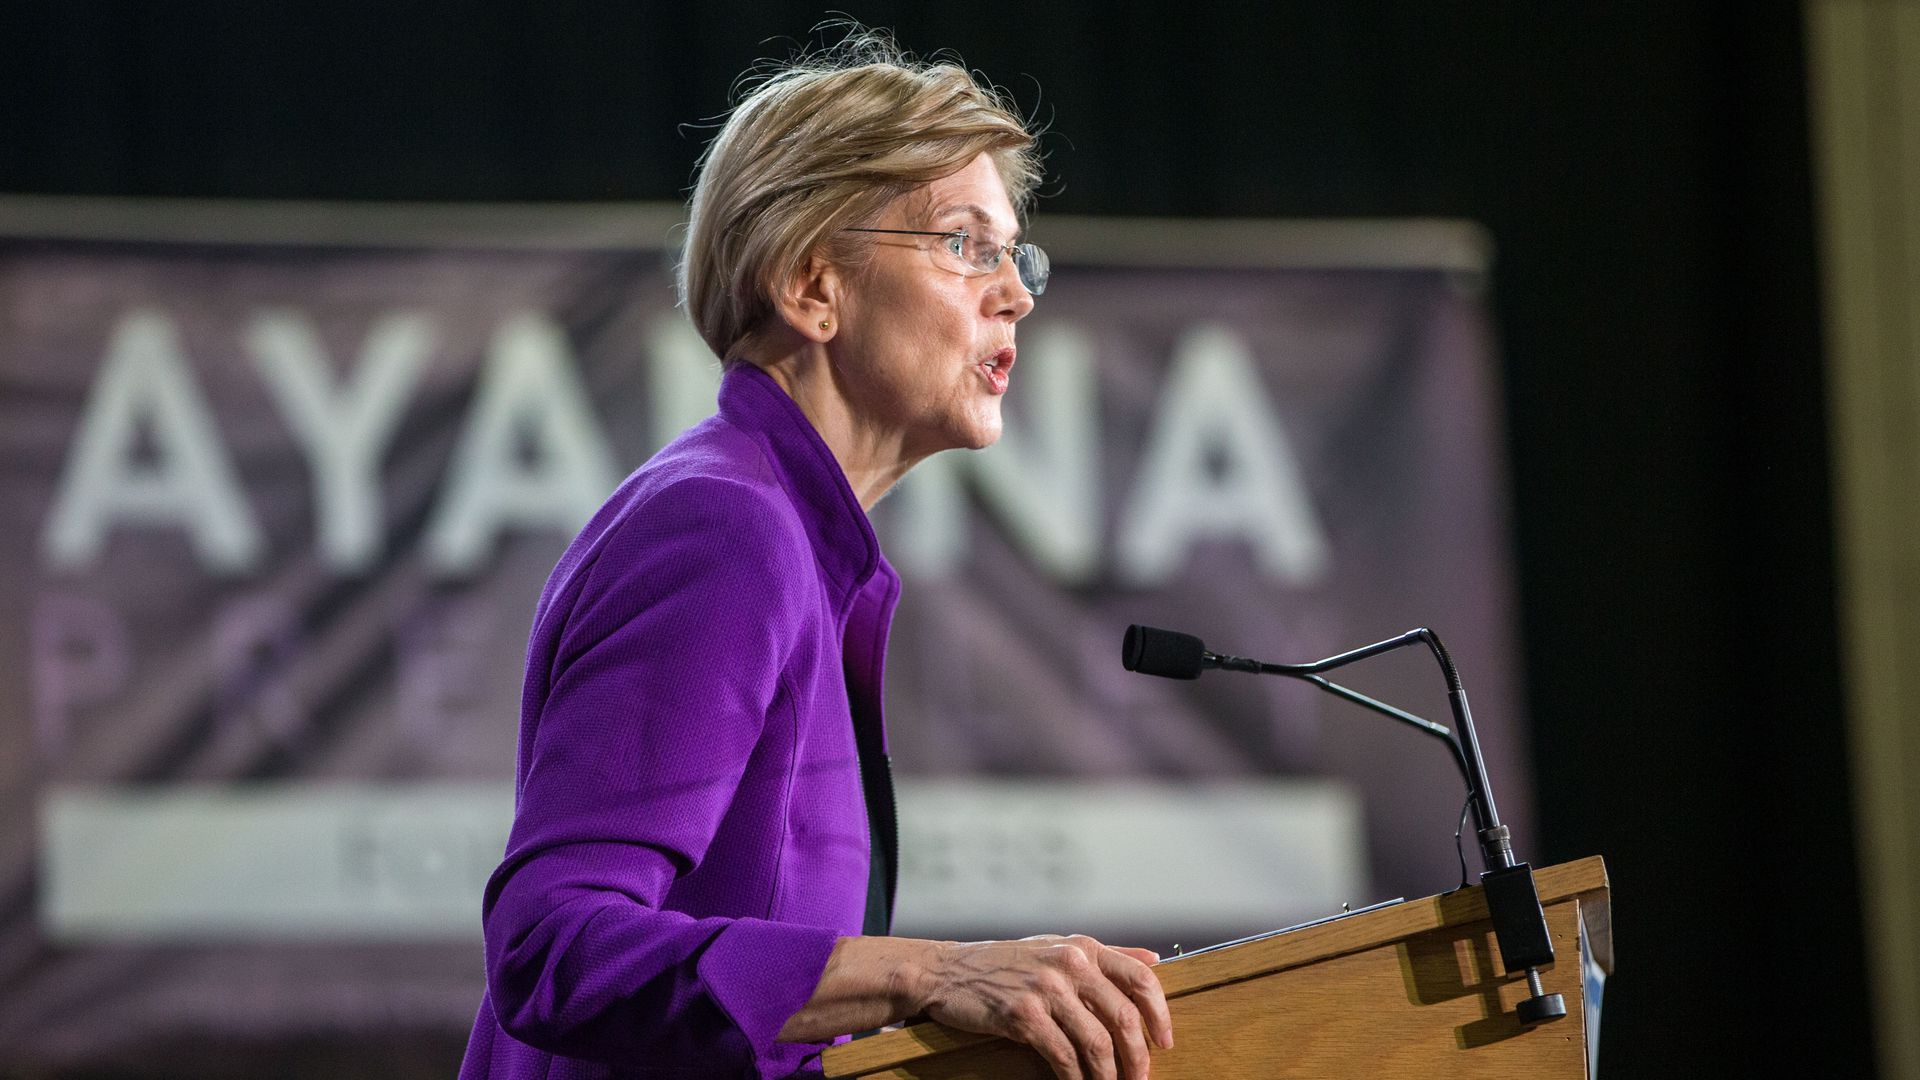 Elizabeth Warren stands at a podium on stage.